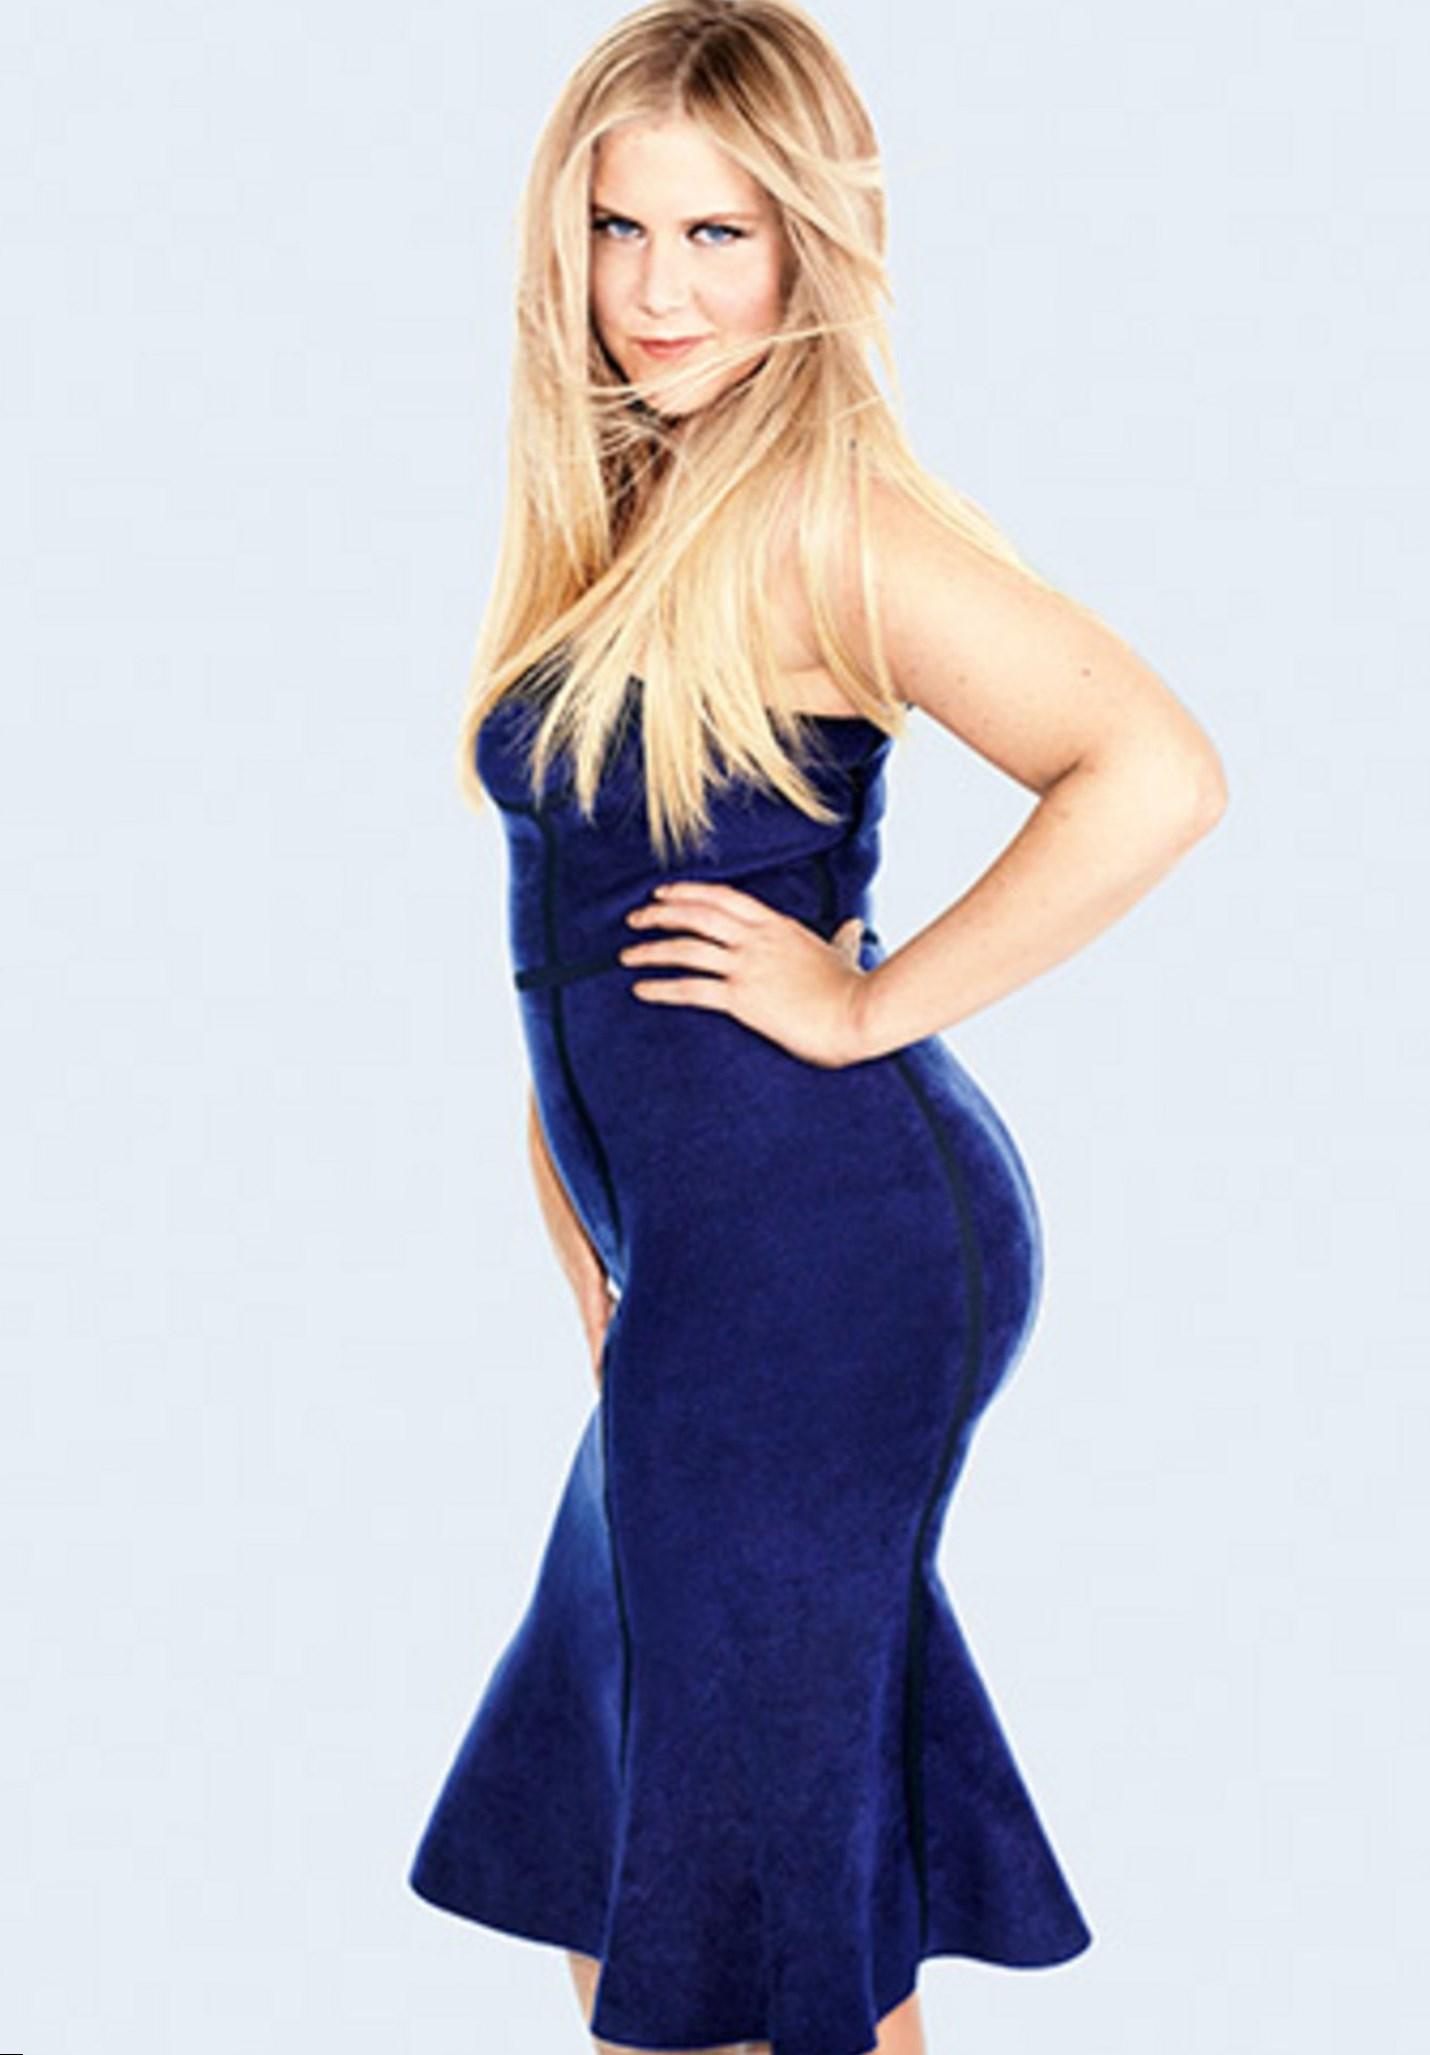 38 inch hips celebrity news